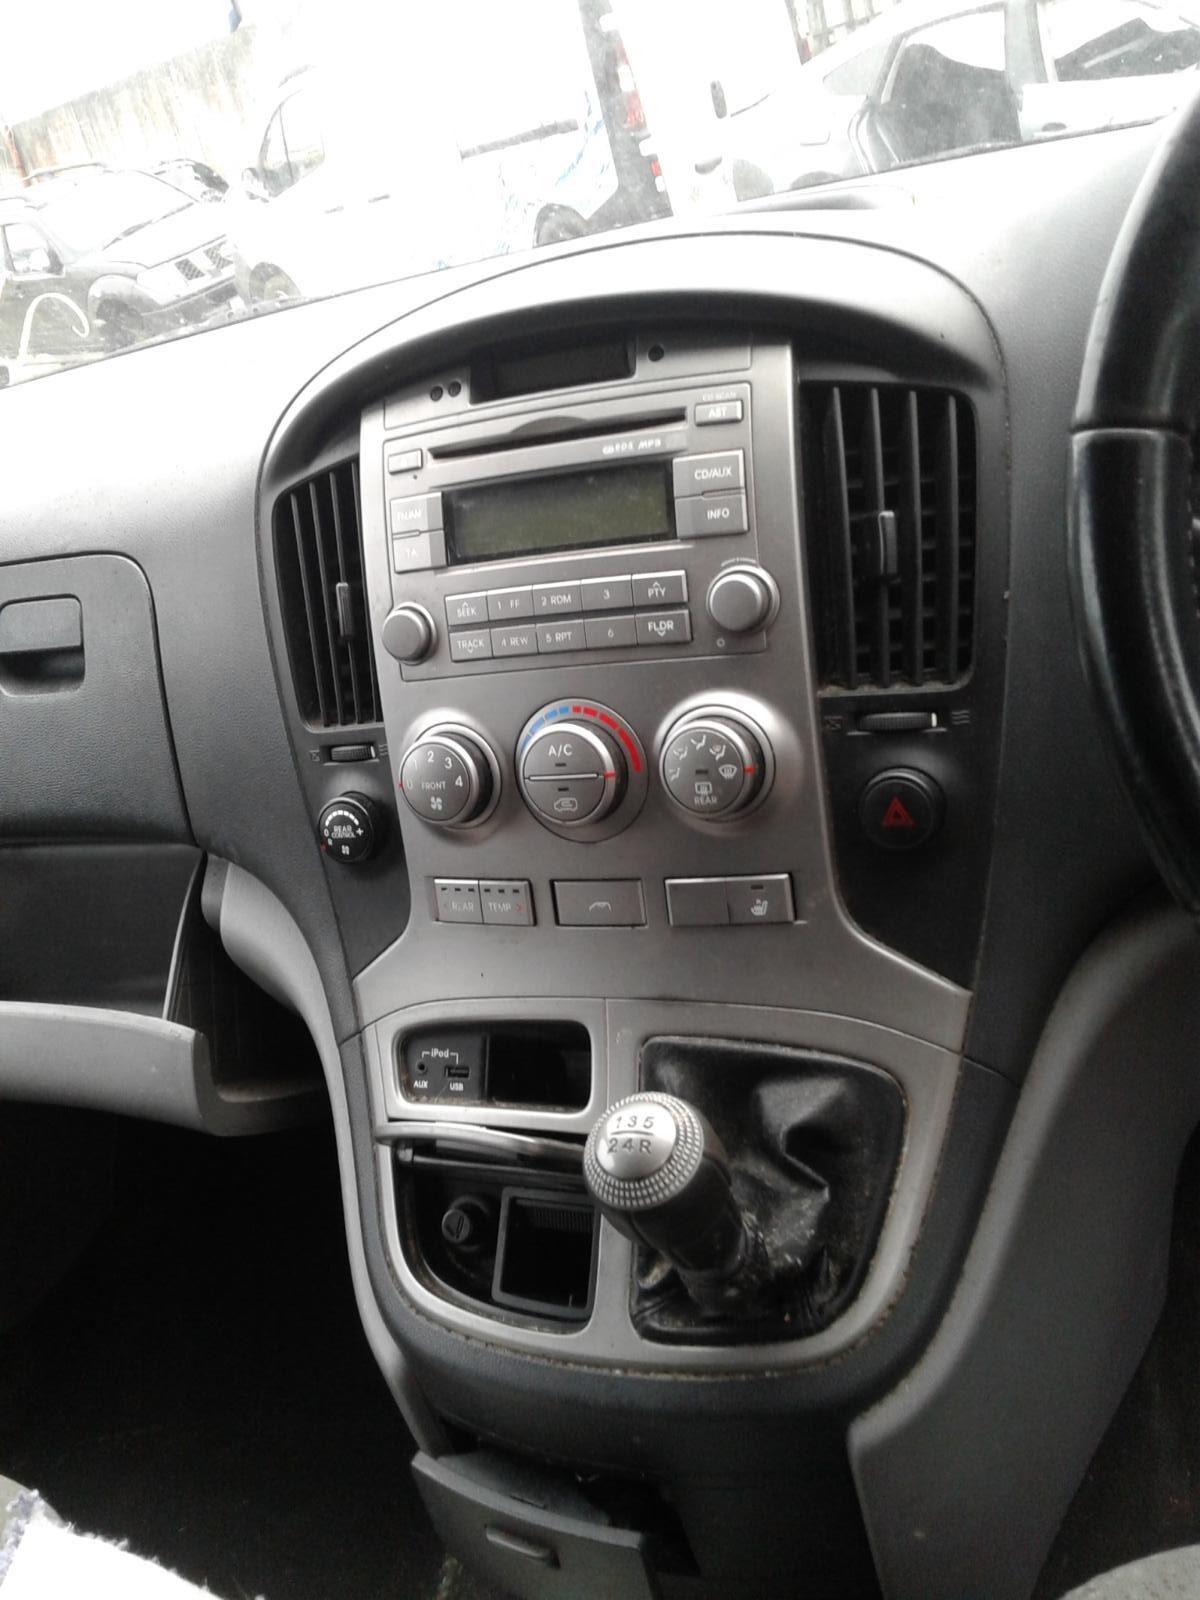 2011 HYUNDAI I800 Image